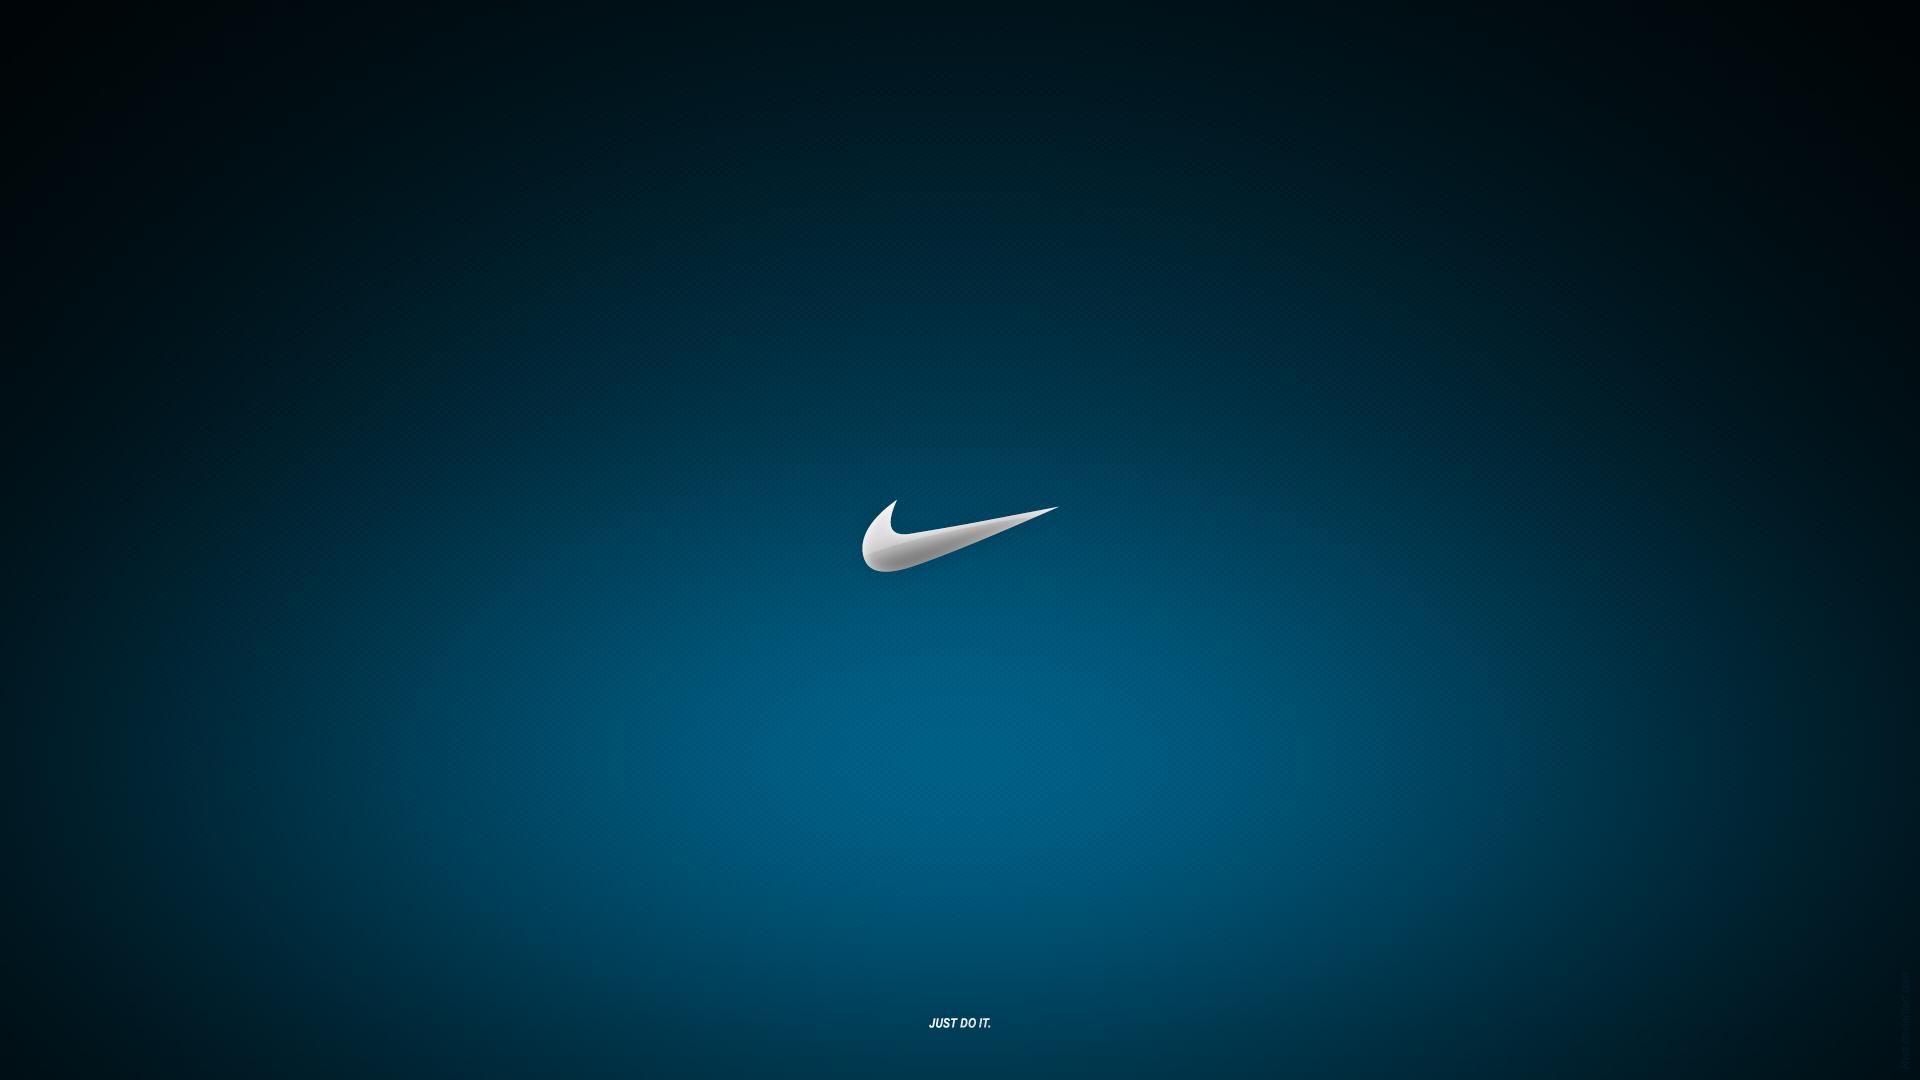 Hd wallpaper nike - Nike Wallpaper Hd 1080p Imagebank Biz